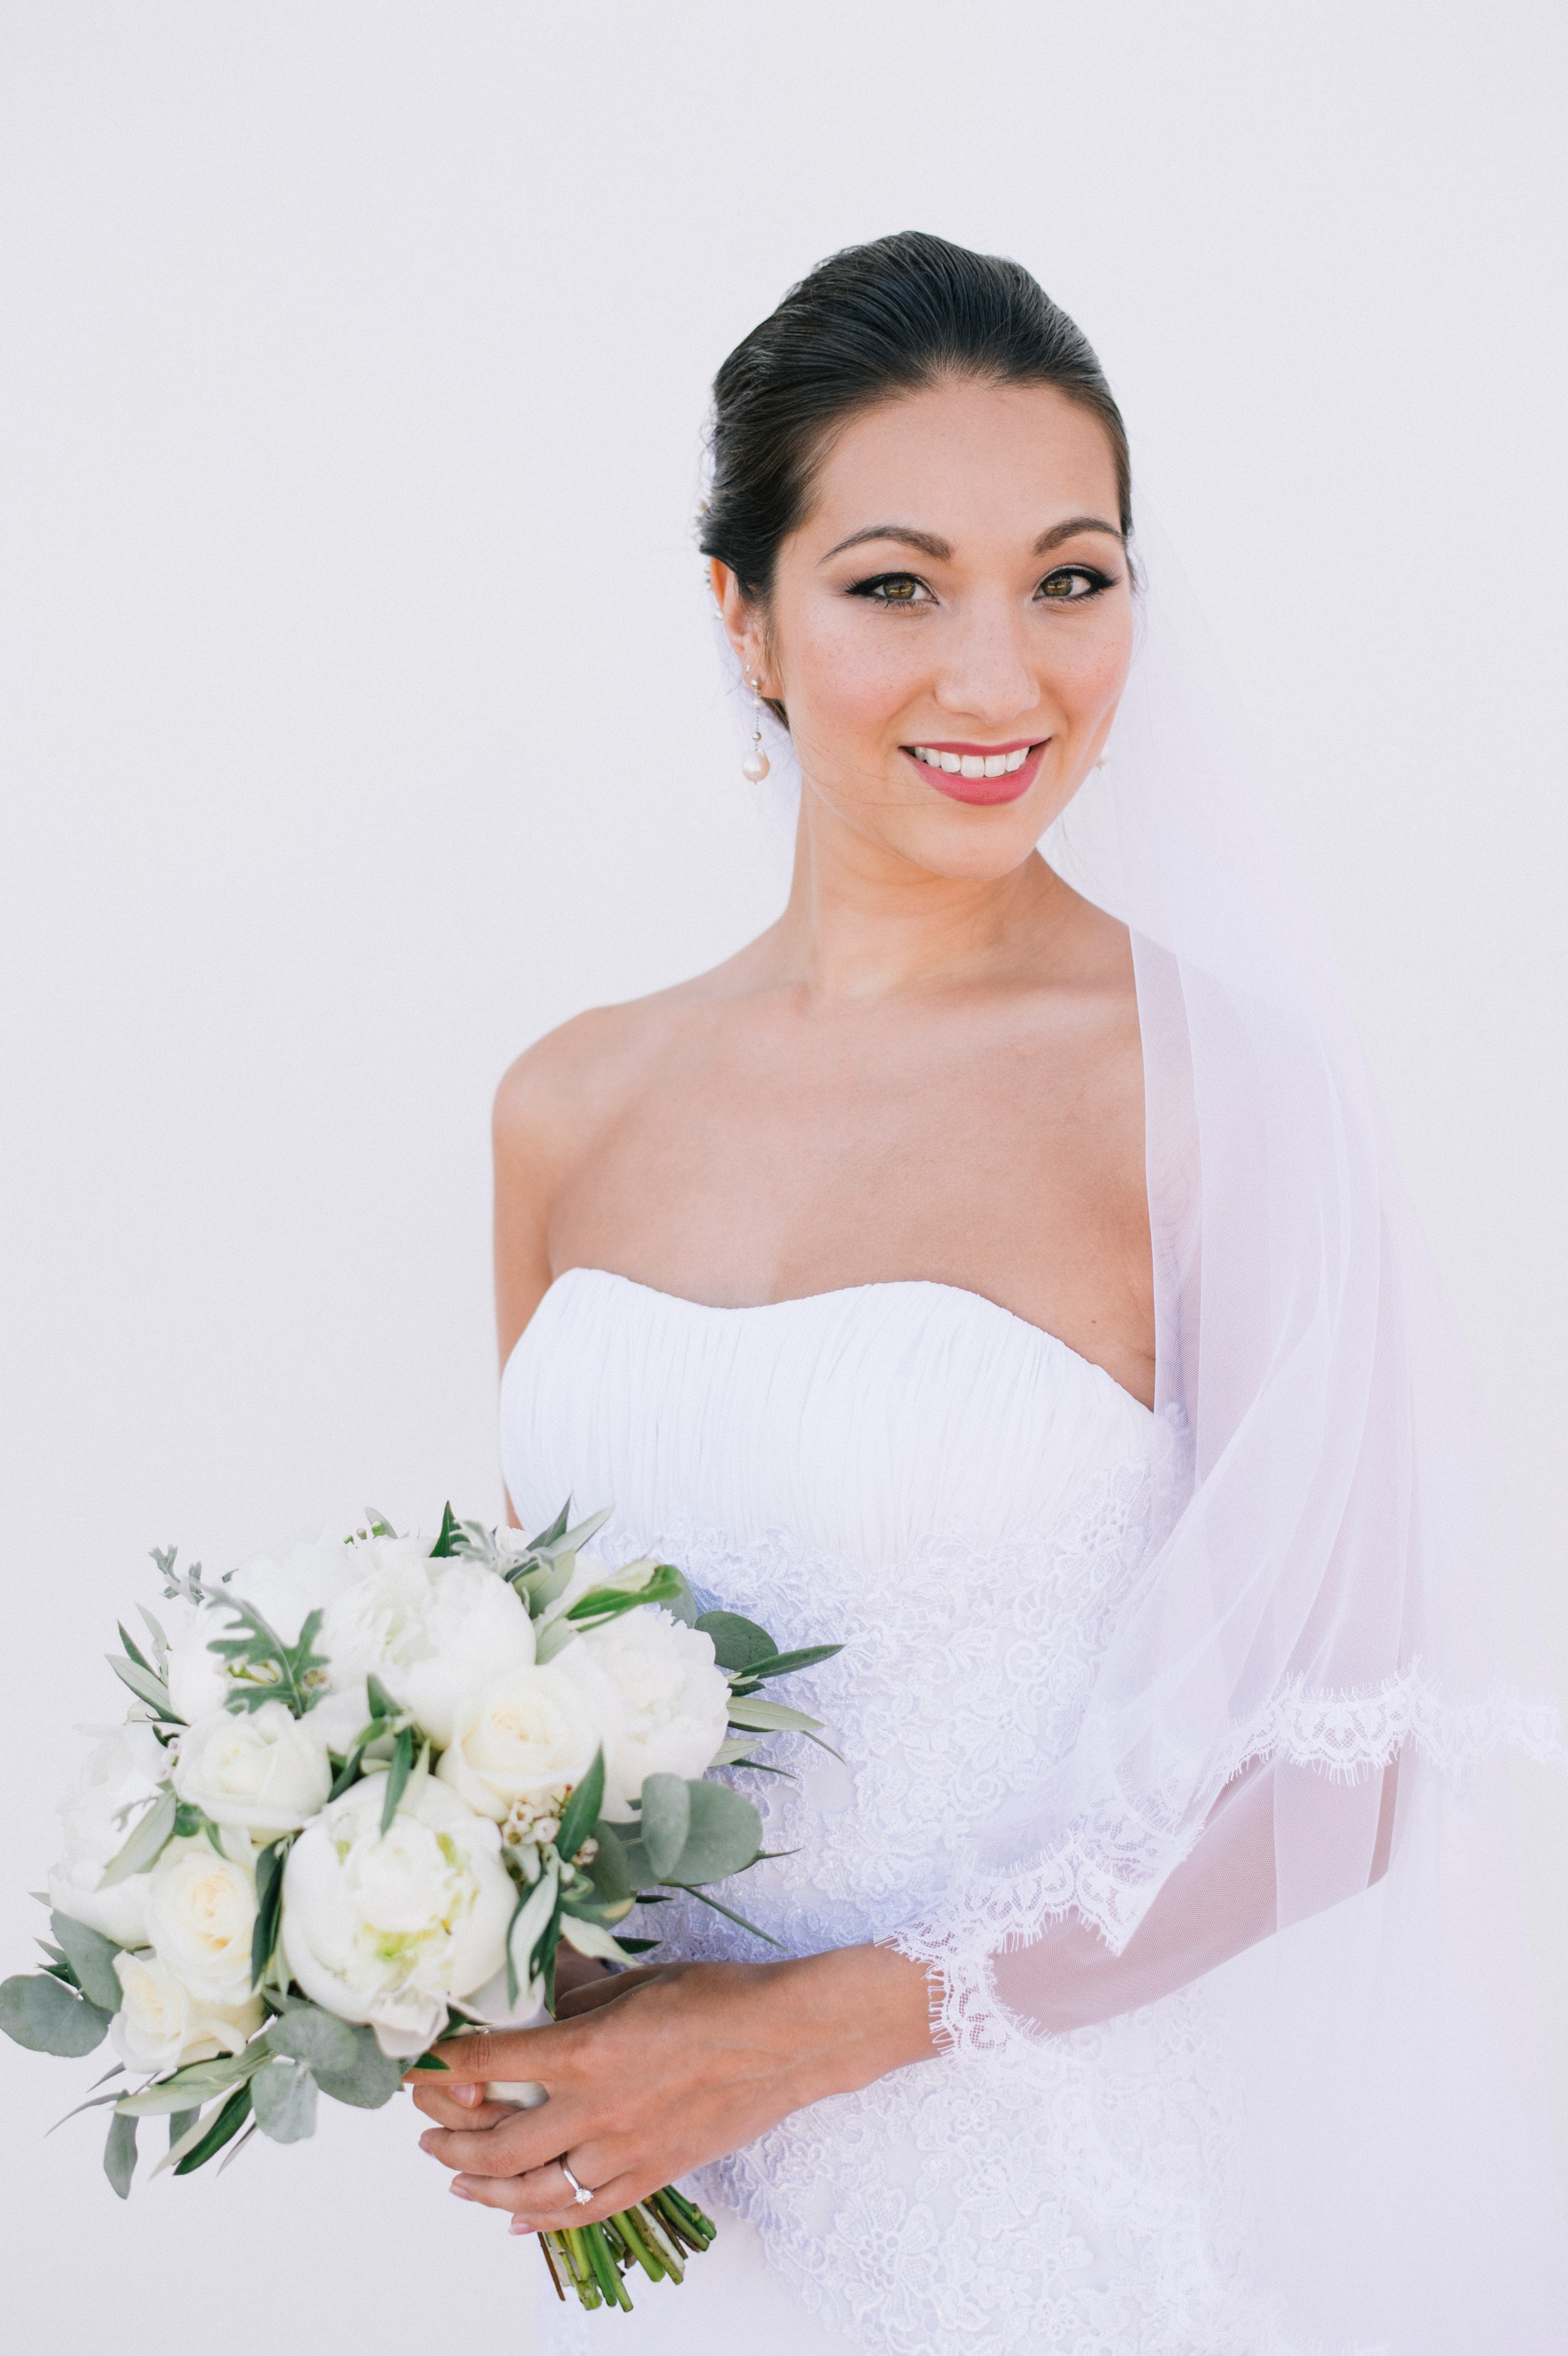 bride's portrait against a white wall